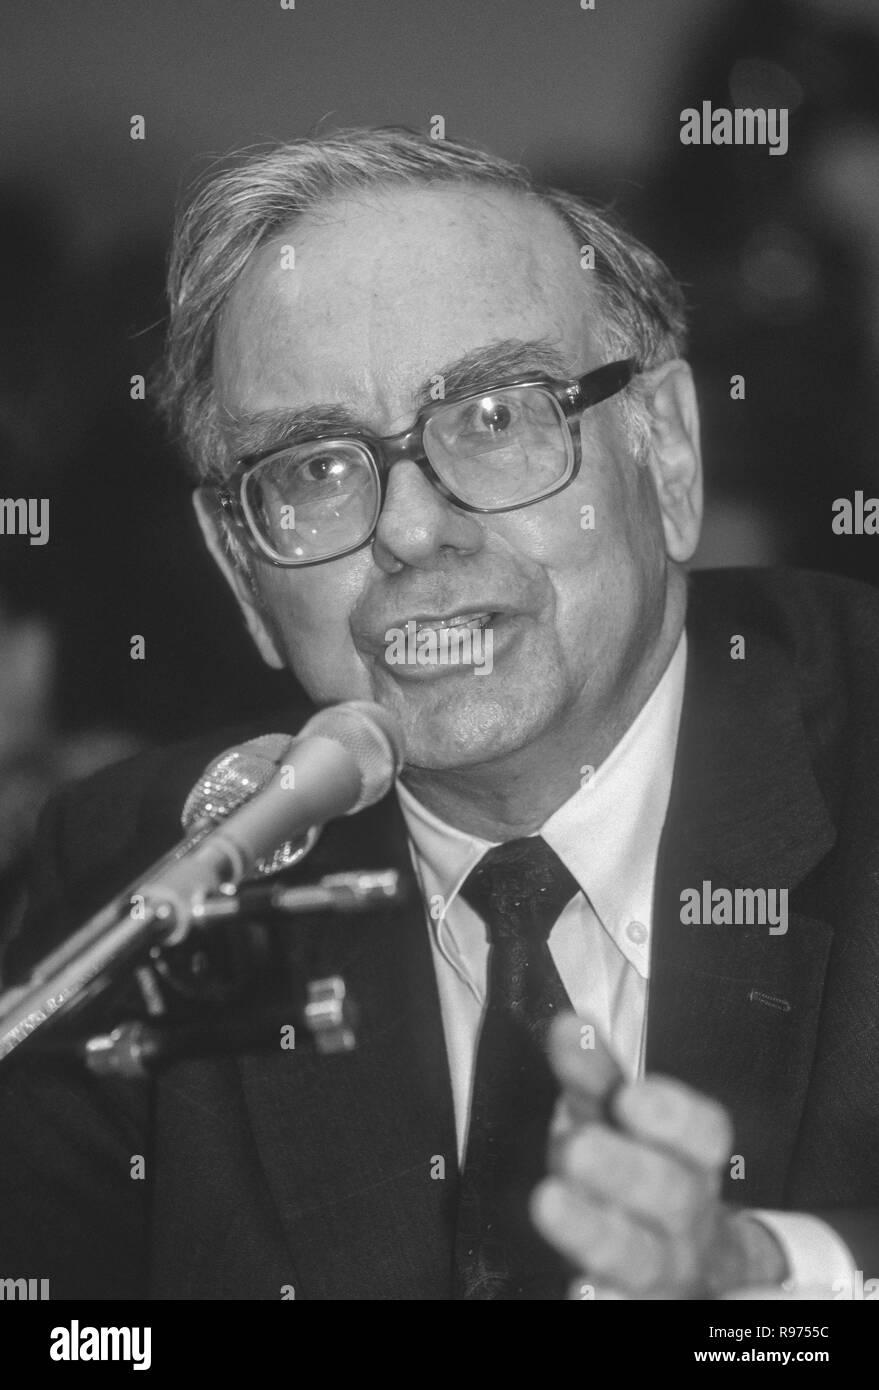 WASHINGTON, DC, USA - SEPTEMBER 4, 1991: Warren Buffett, Chairman Salomon Brothers, testifies before U.S. House Subcmte. on Telecommunications. - Stock Image